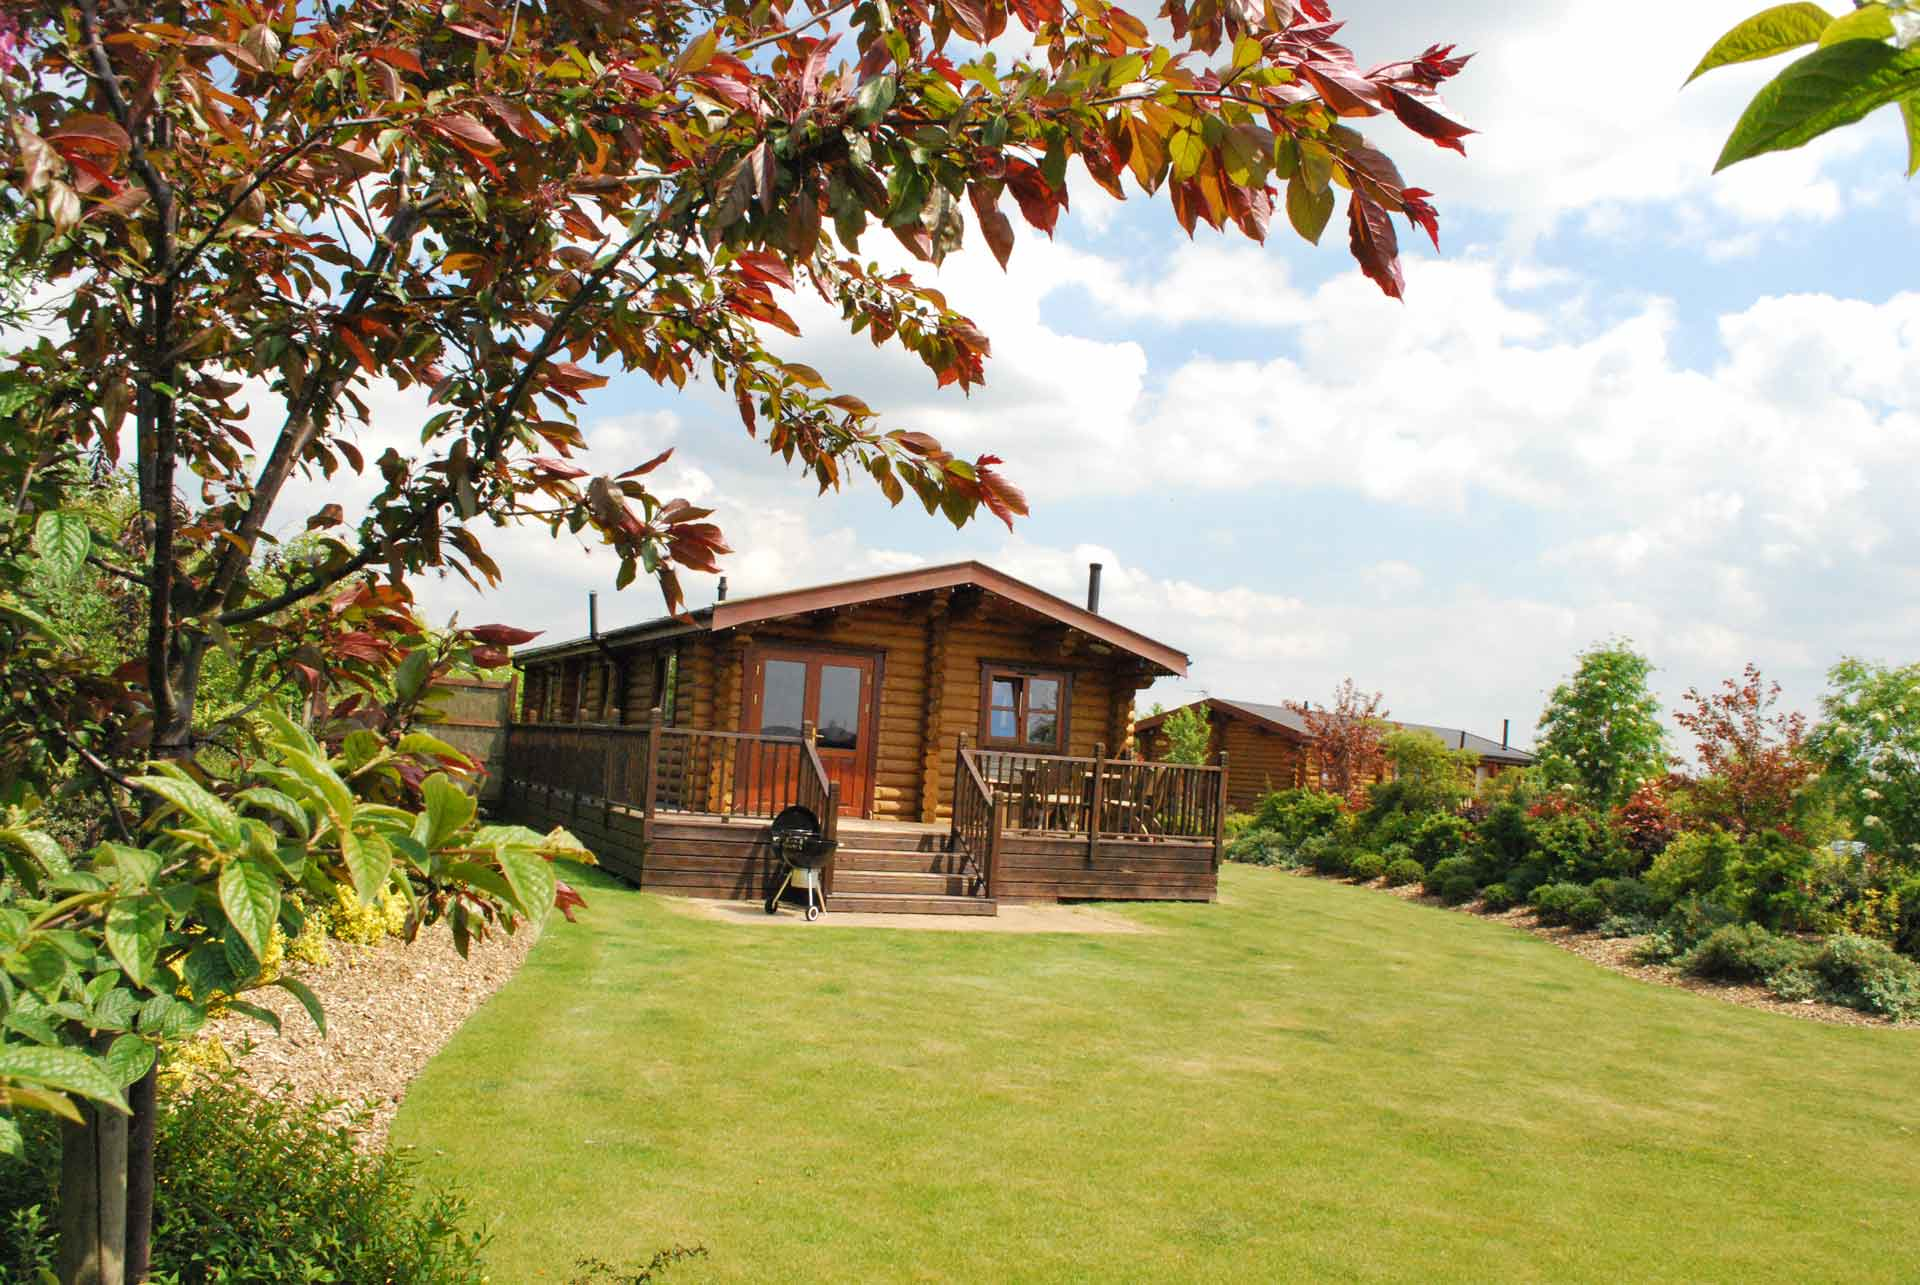 Willow-Lodge-Outside-Eye-Kettleby-Lakes